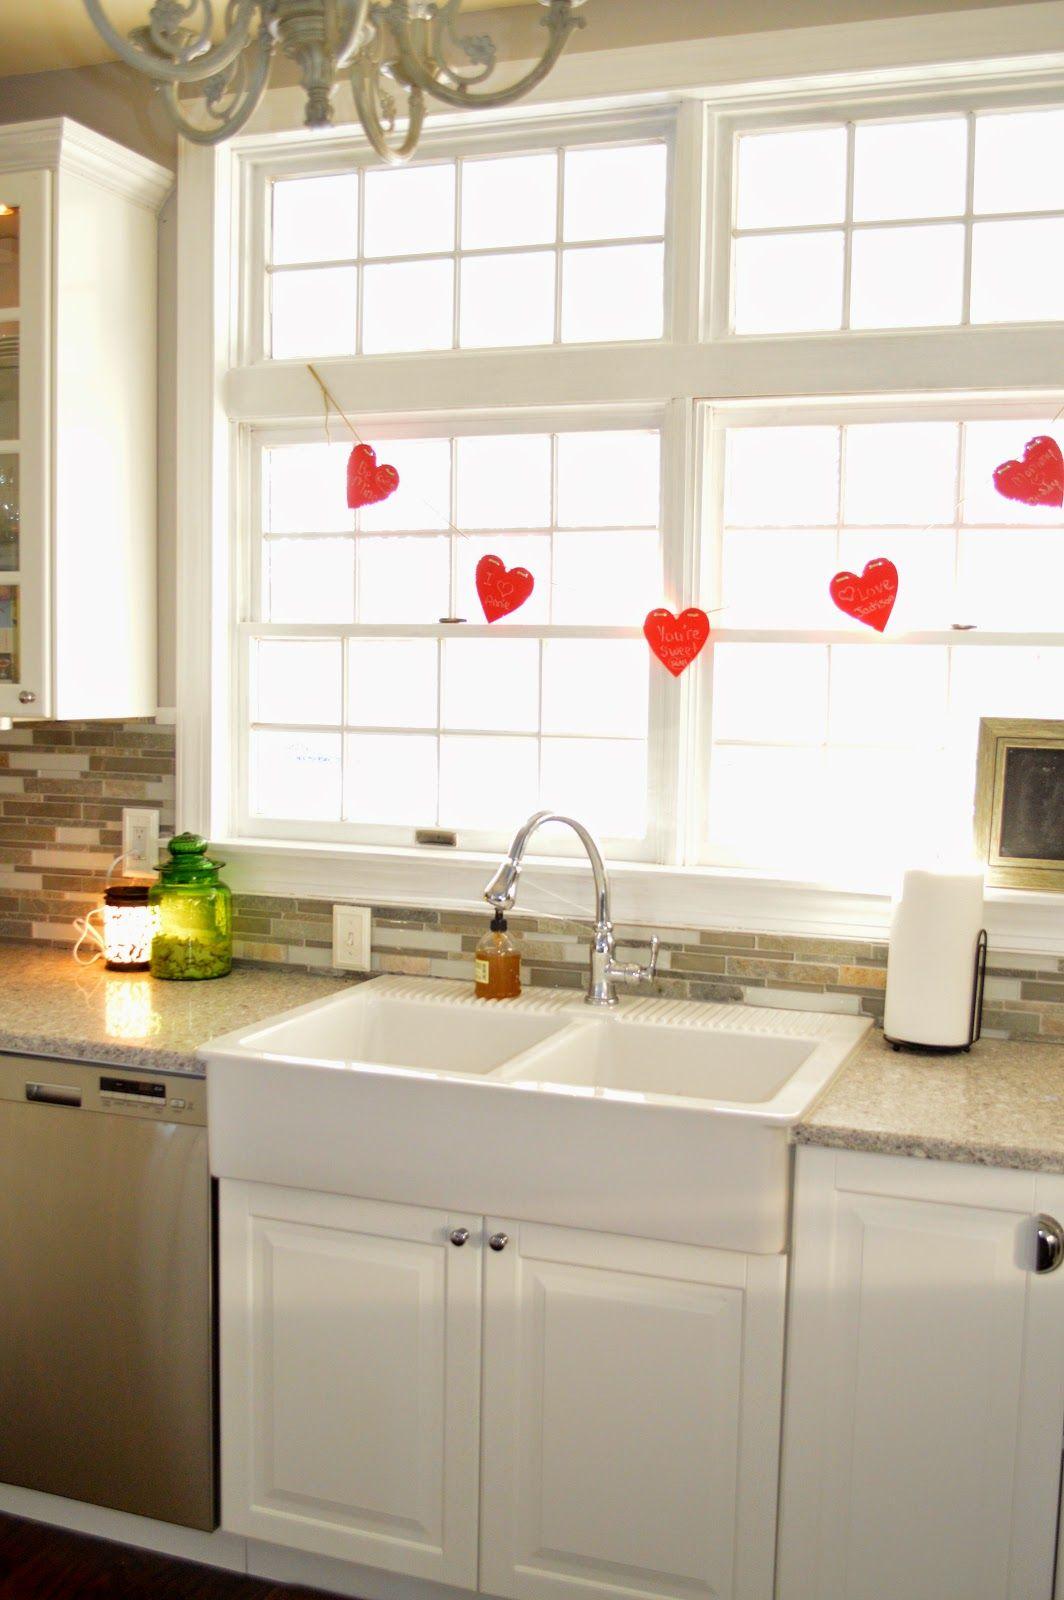 ikea farmhouse sink kitchen decor pinterest. Black Bedroom Furniture Sets. Home Design Ideas